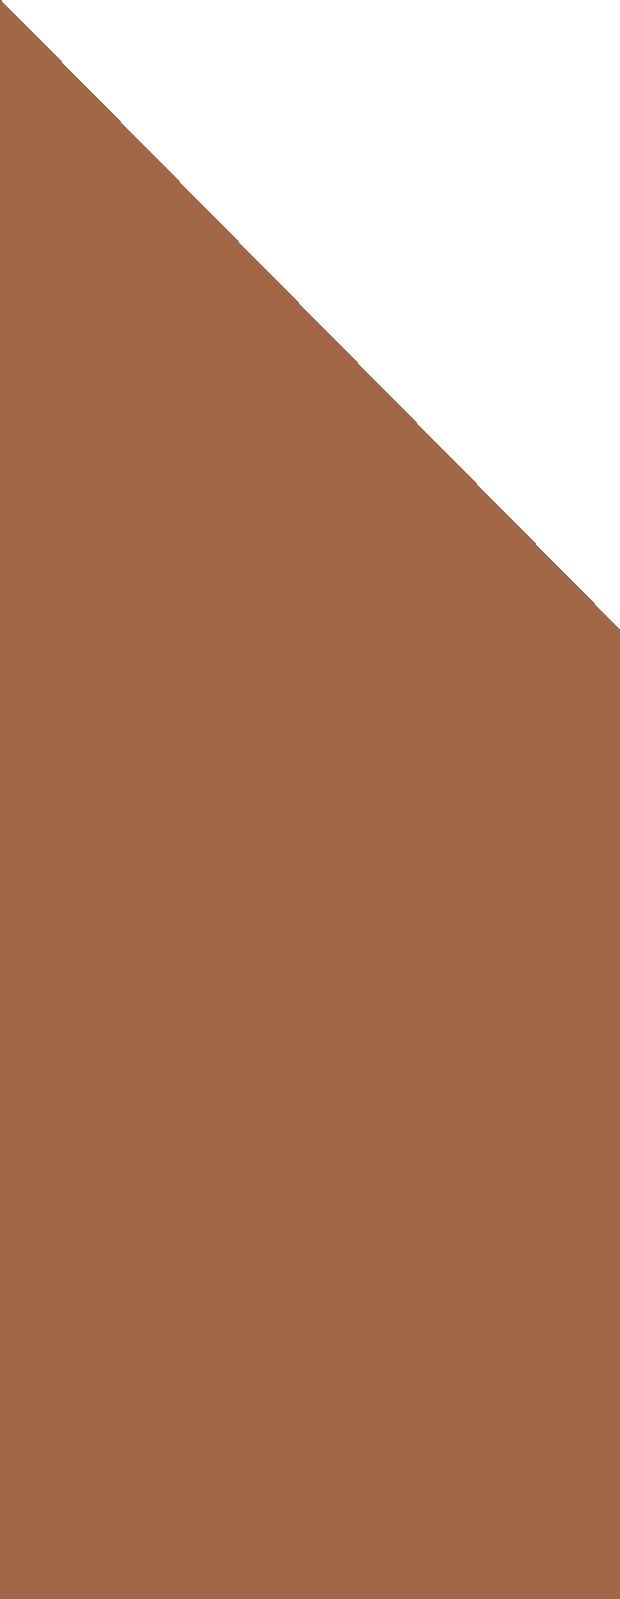 Brown Parallelogram